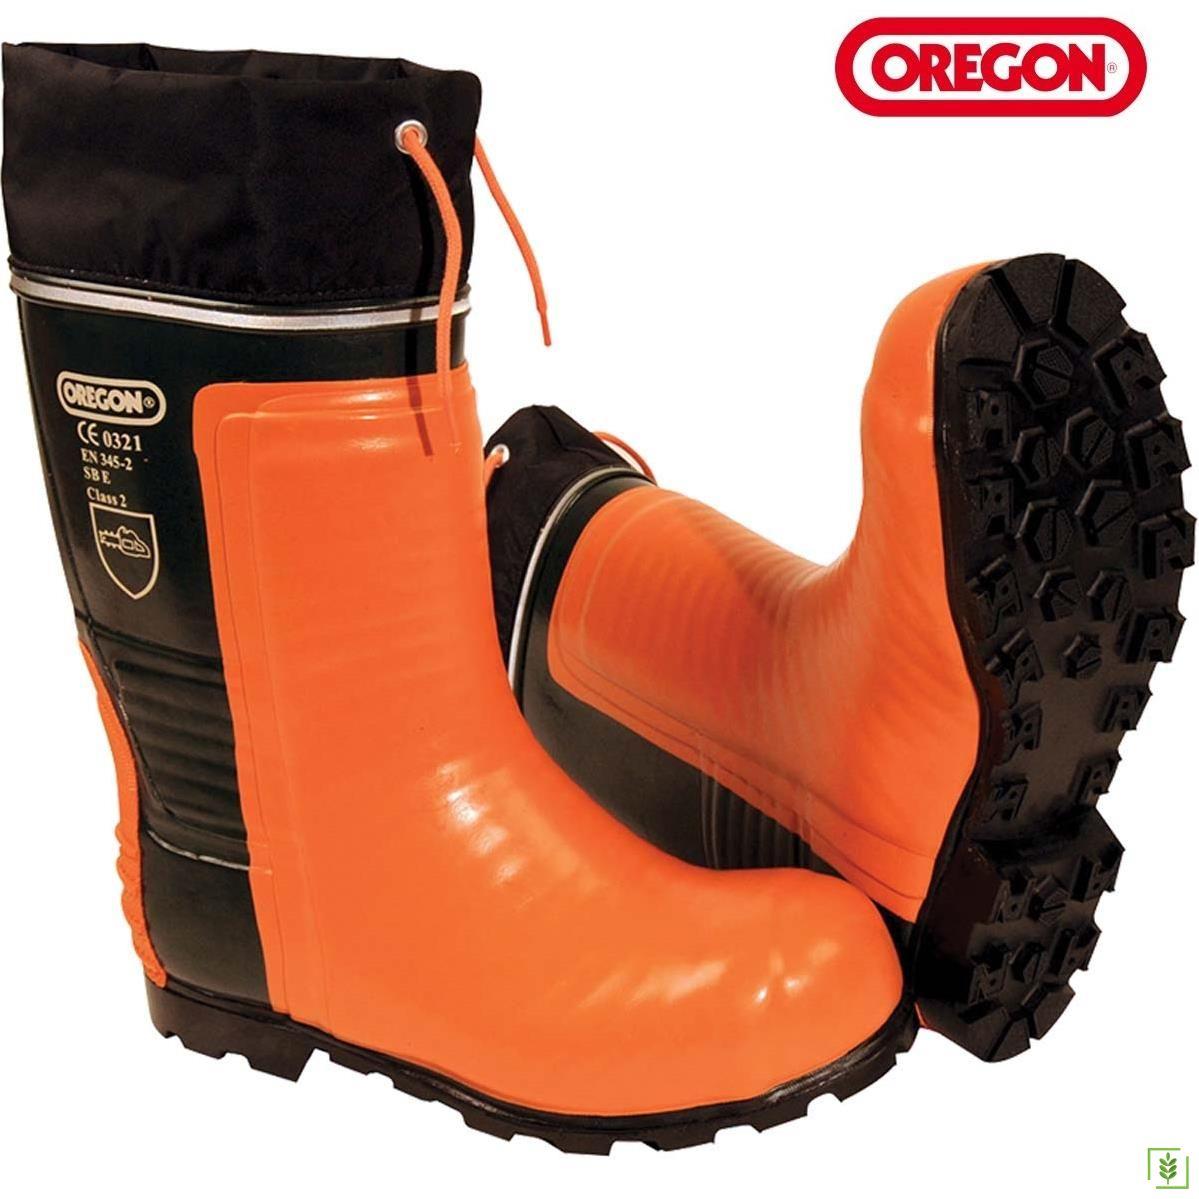 Oregon 295385/41 Zincir Kesmez Çizme 41 Numara